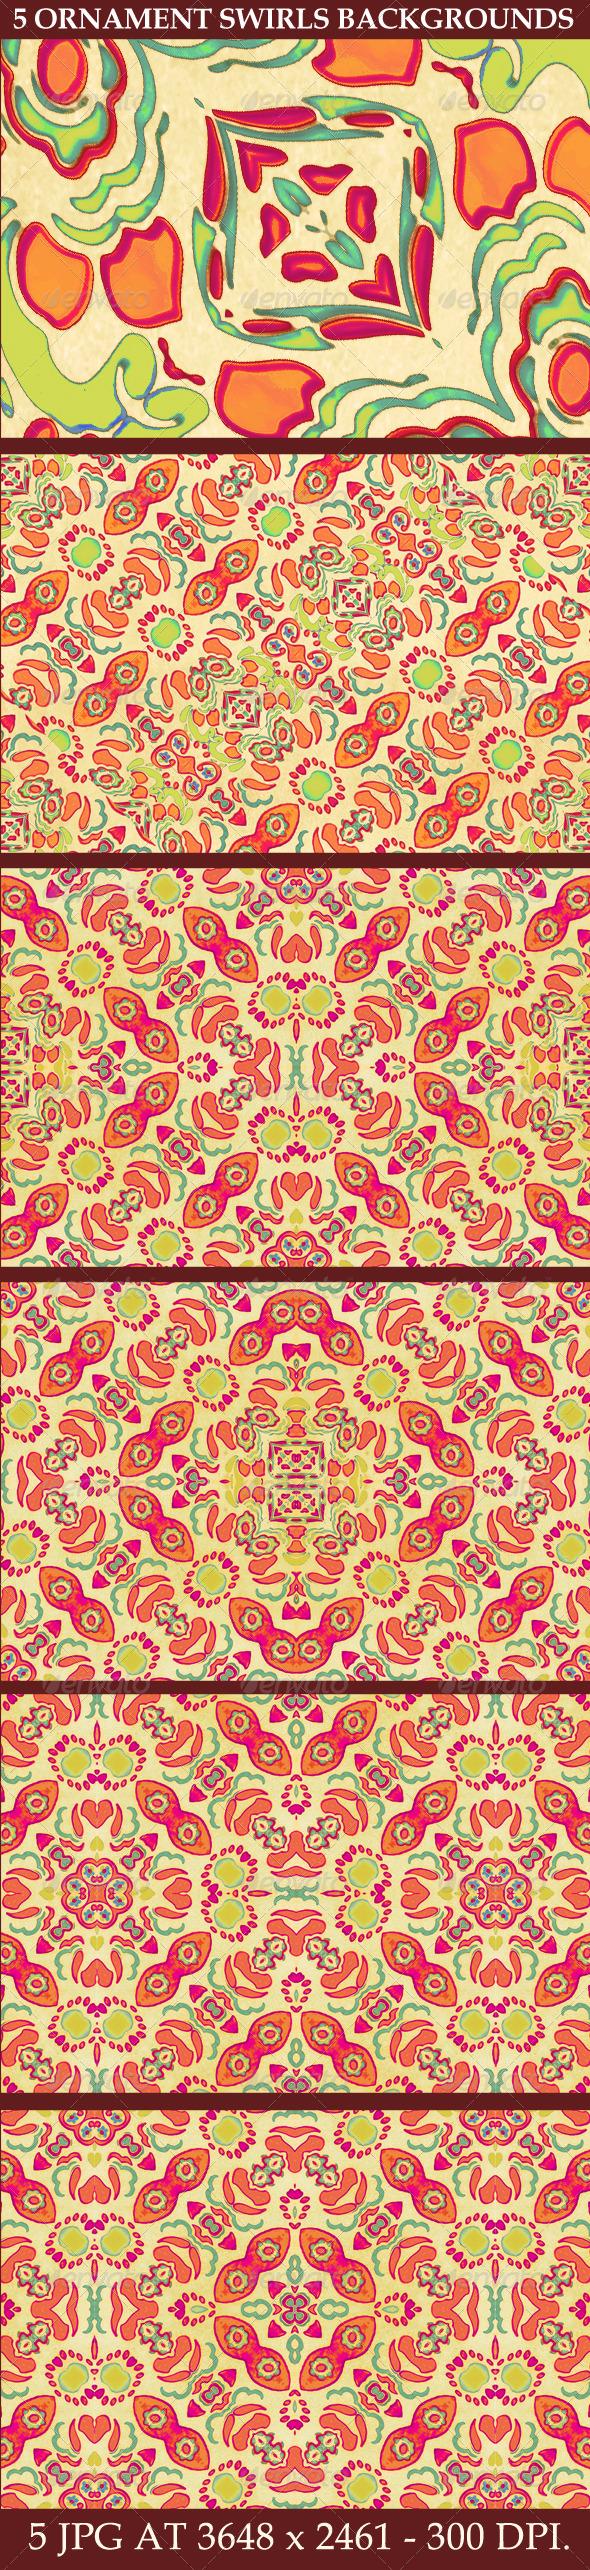 5 Multicolored Ornament Swirls Backgrounds - Flourishes / Swirls Decorative